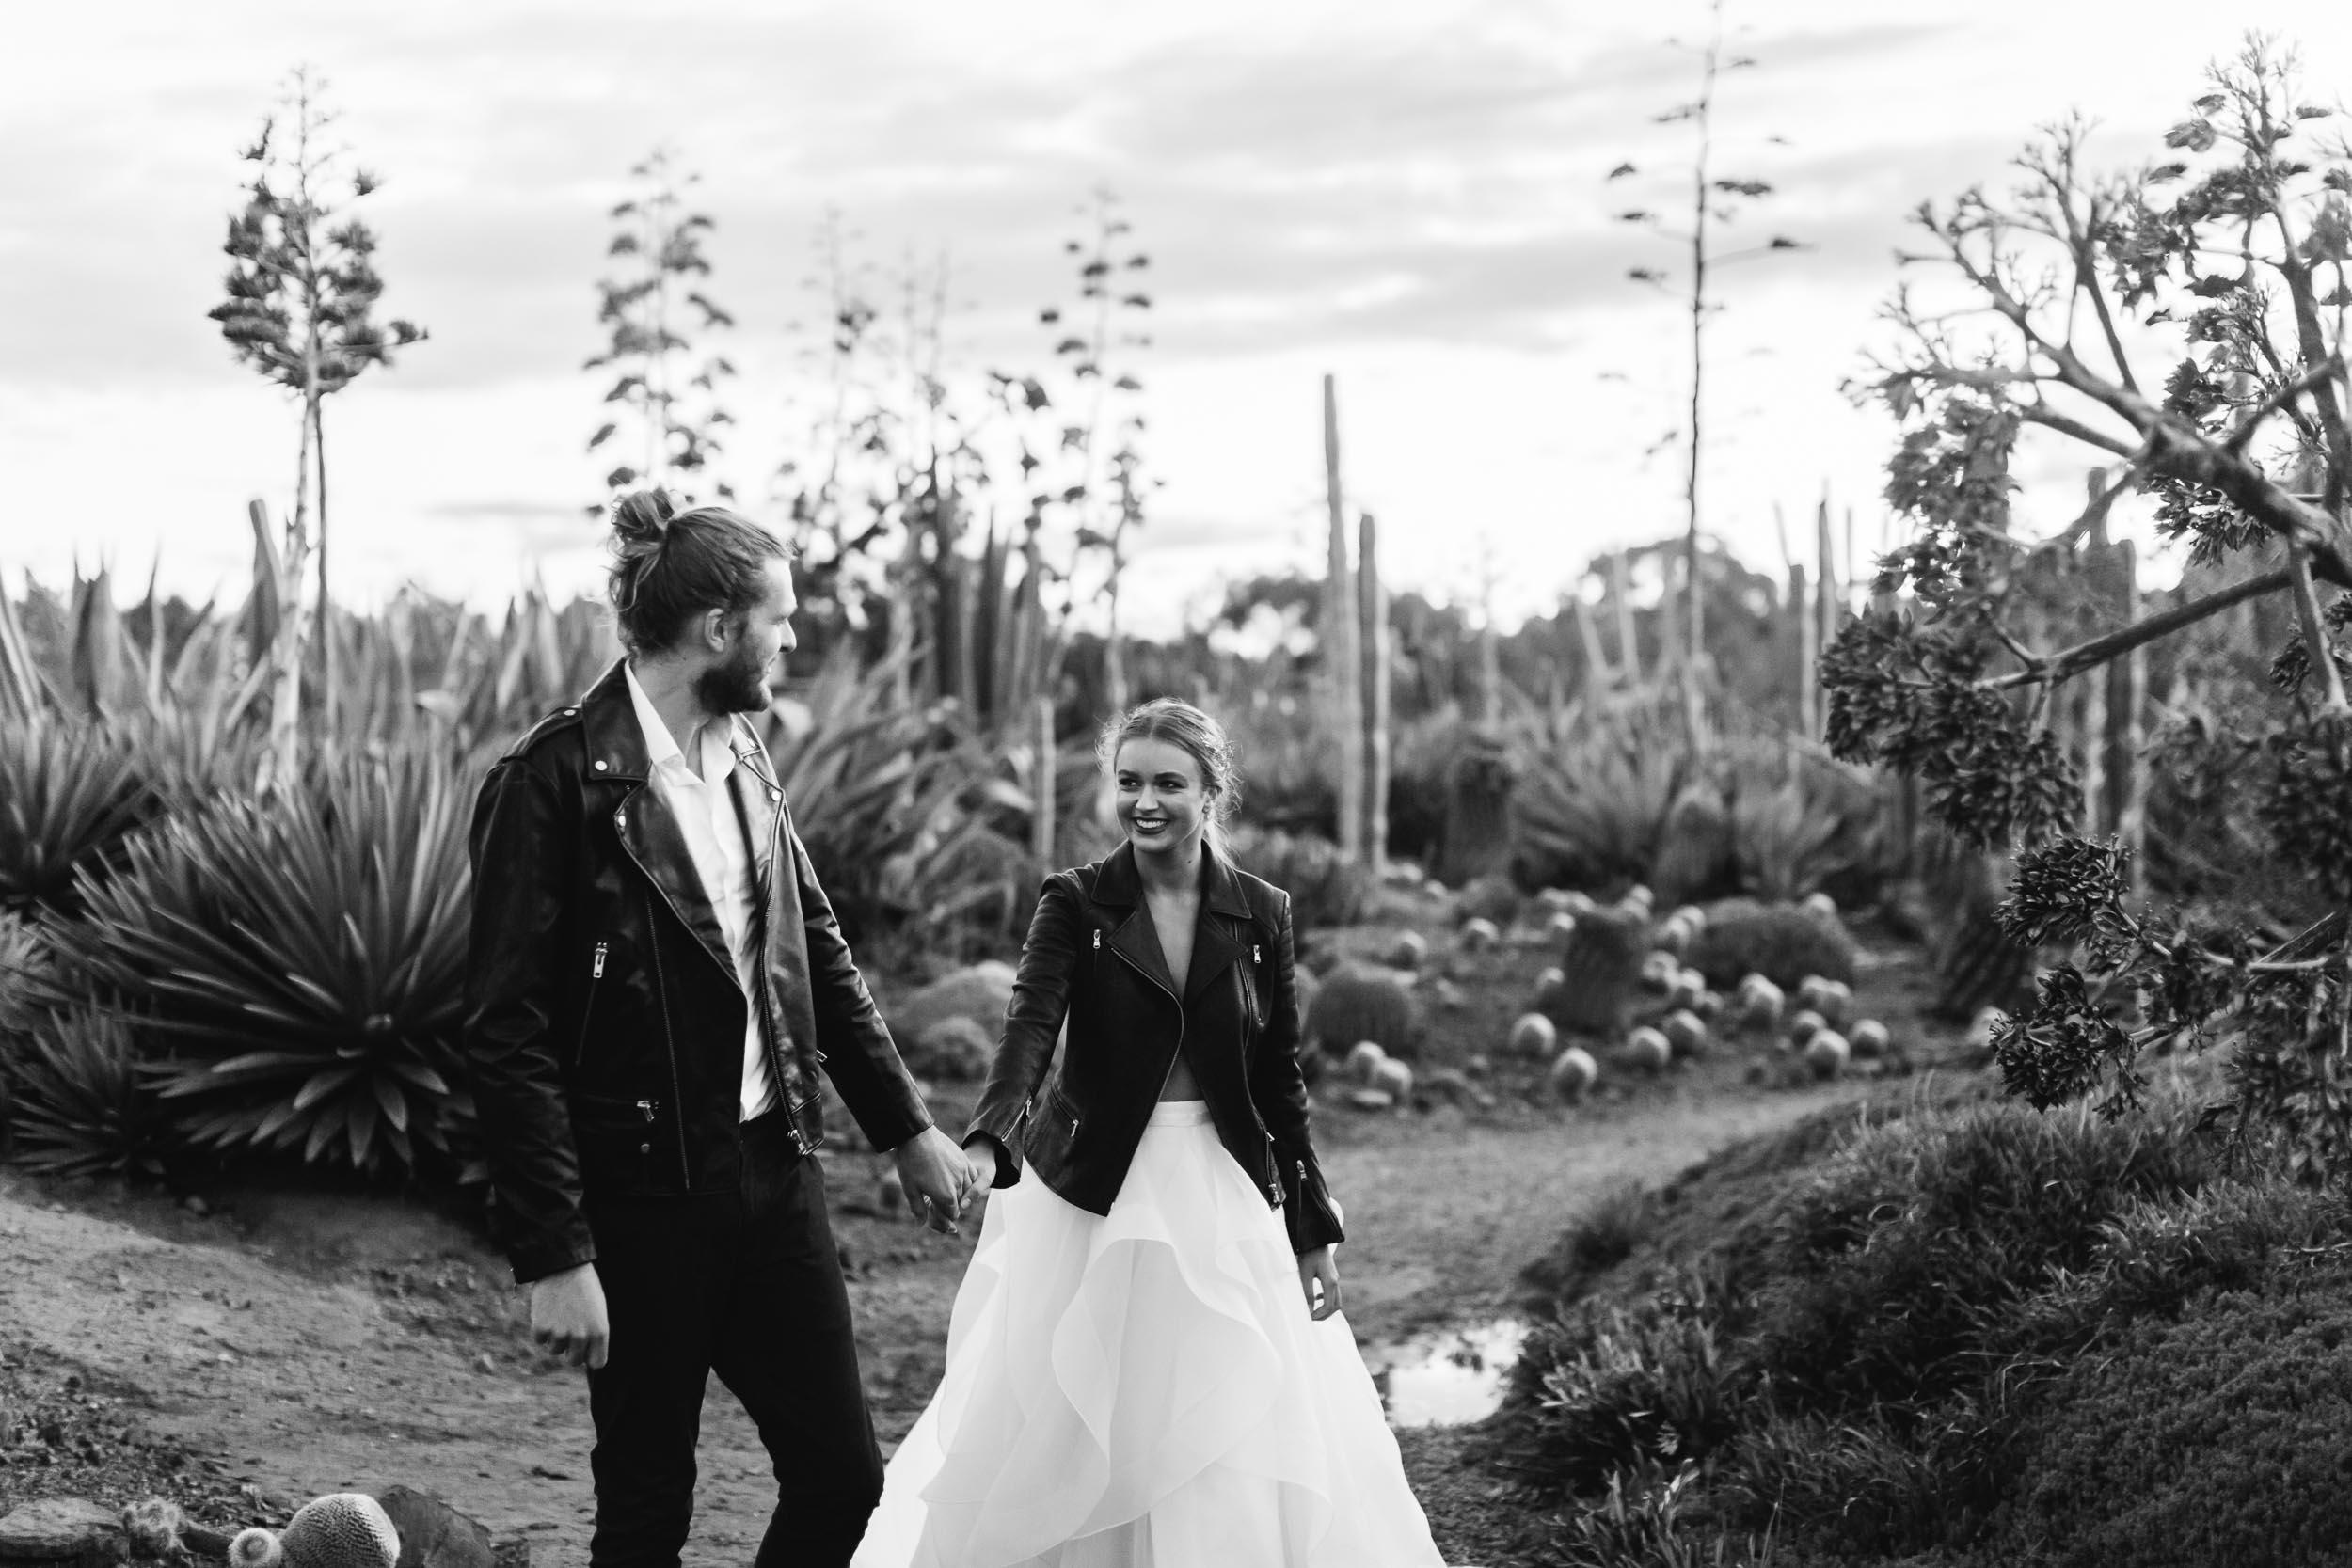 Kas-Richards-Ruby-and-James-Stylist-Cactus-Country-Karen-Willis-Holmes-Bridal-One-Heart-Studios-Boho-Wedding-200.jpg